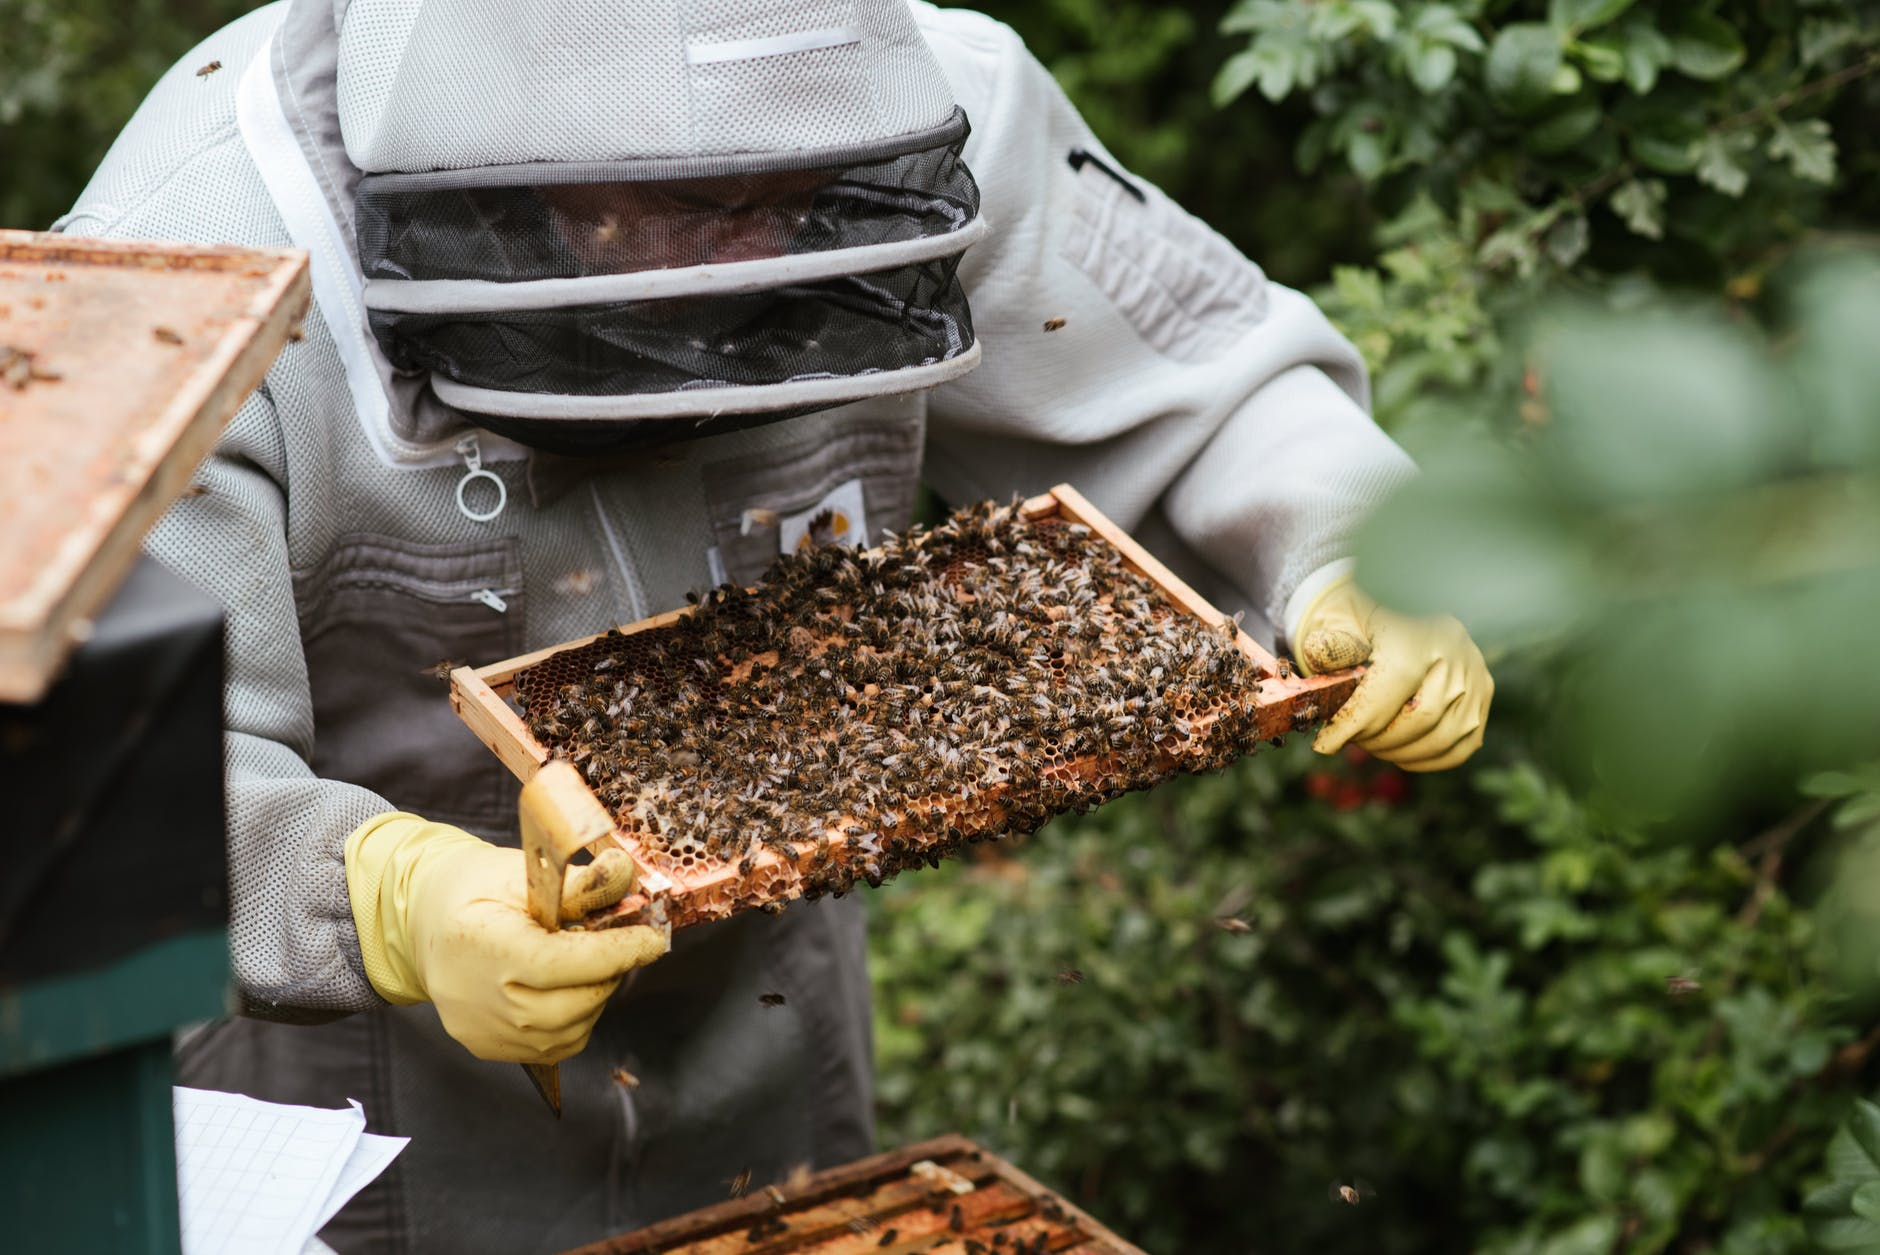 crop beekeeper considering honeycomb in apiary